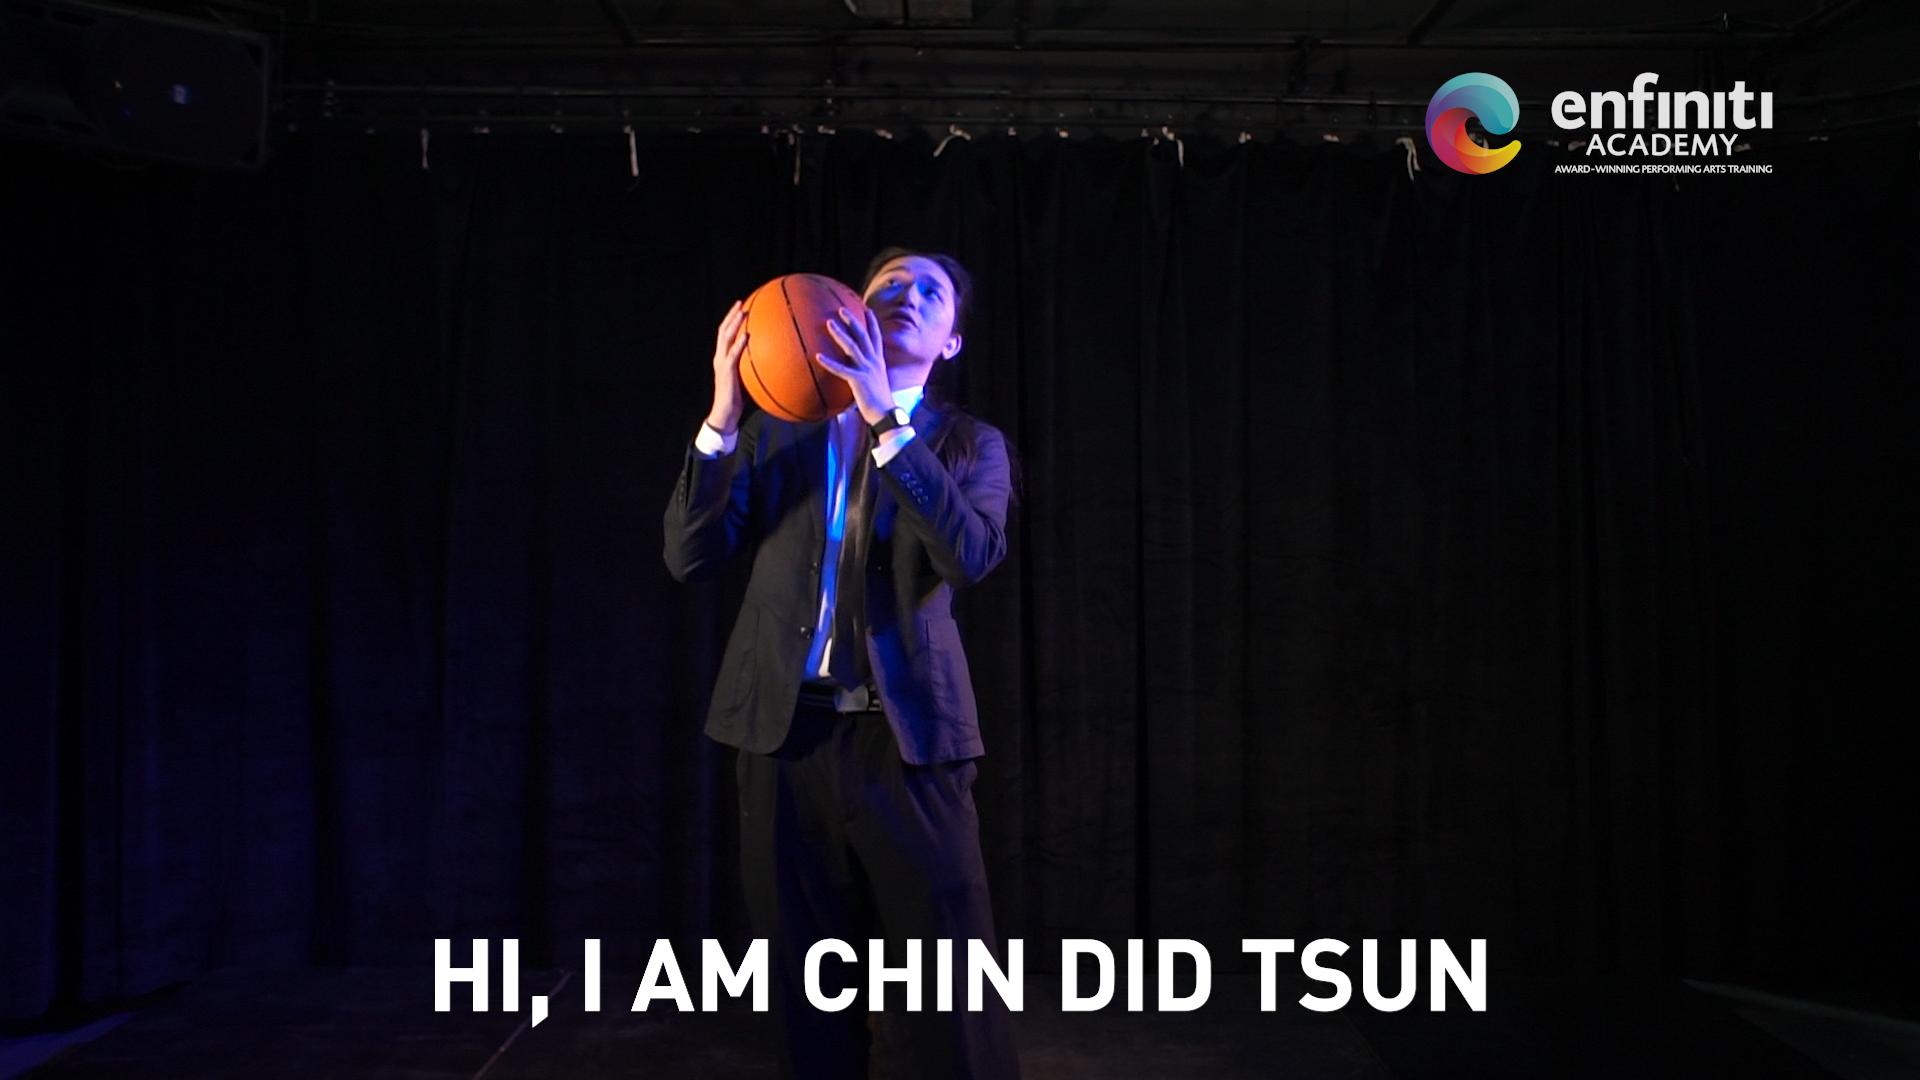 Chin Did Tsun